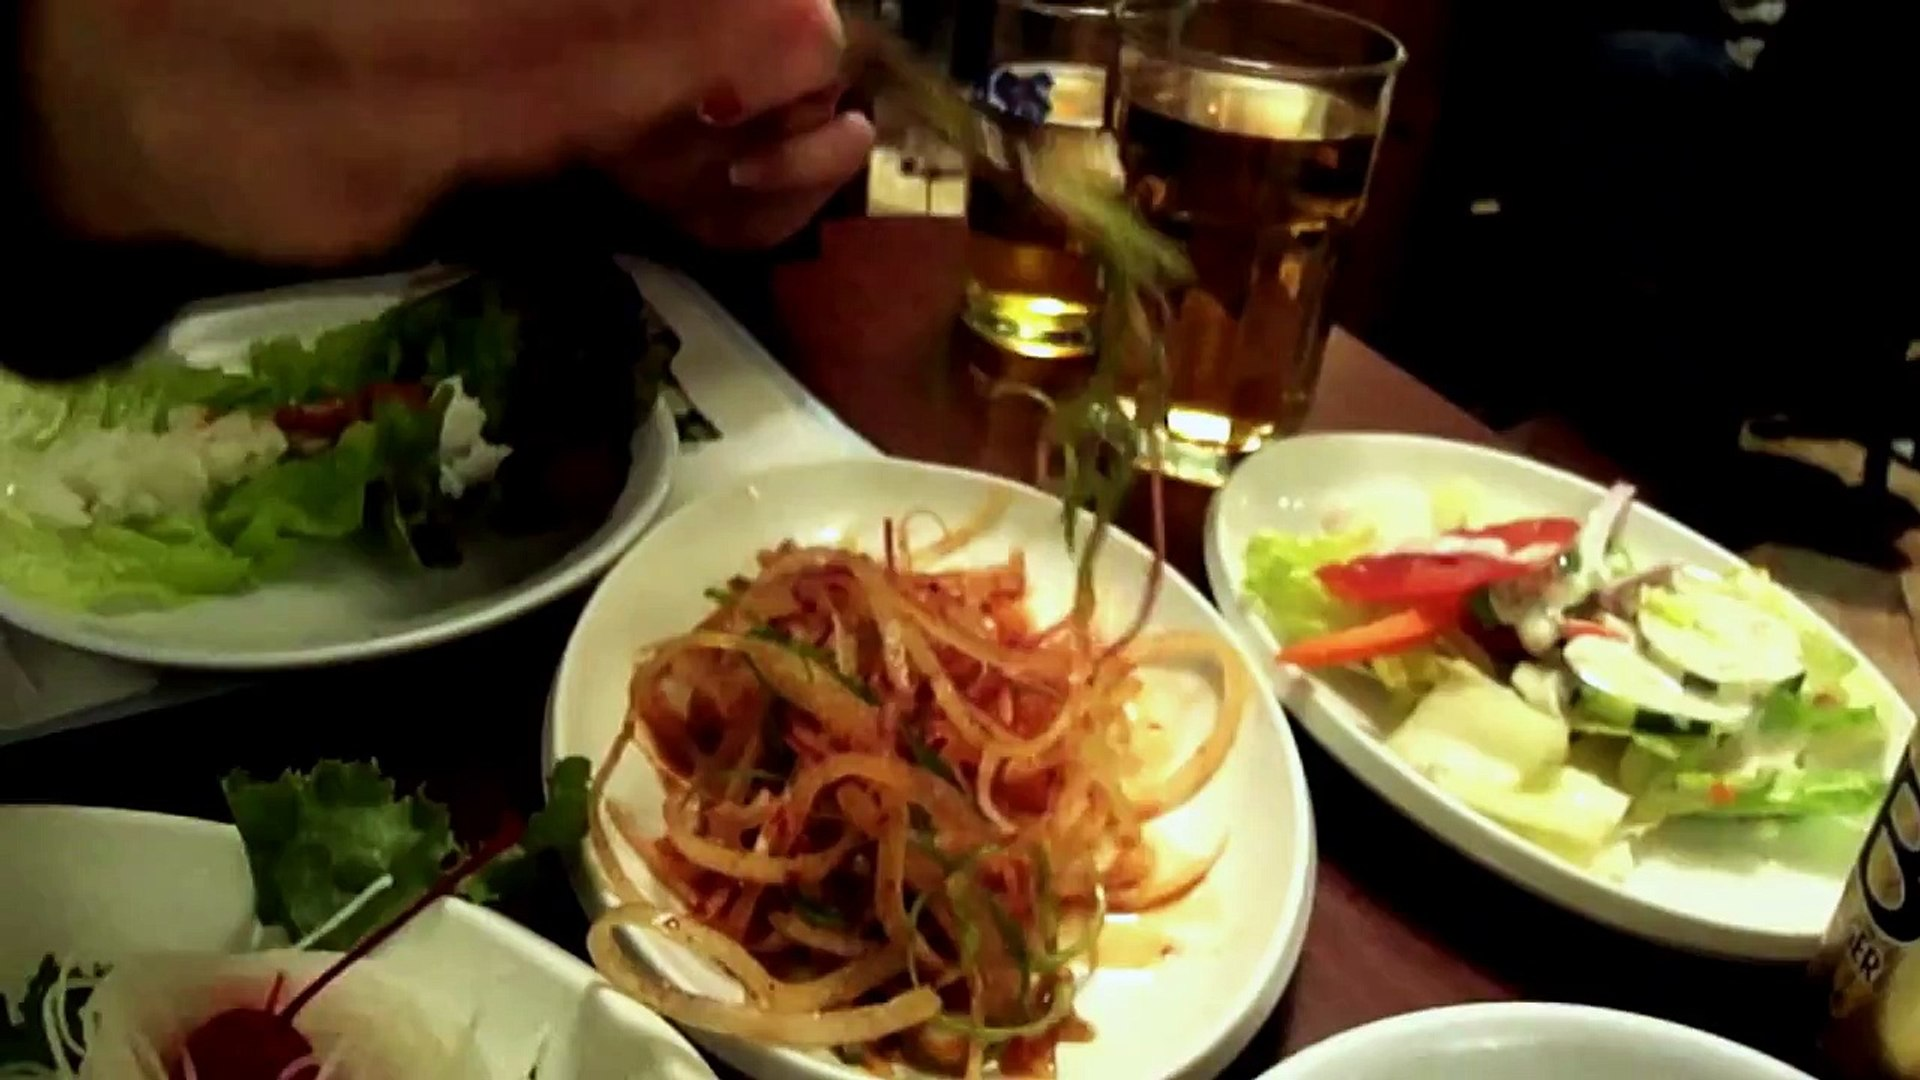 taste of korean cuisine recipes | easy recipes | simple food recipes |